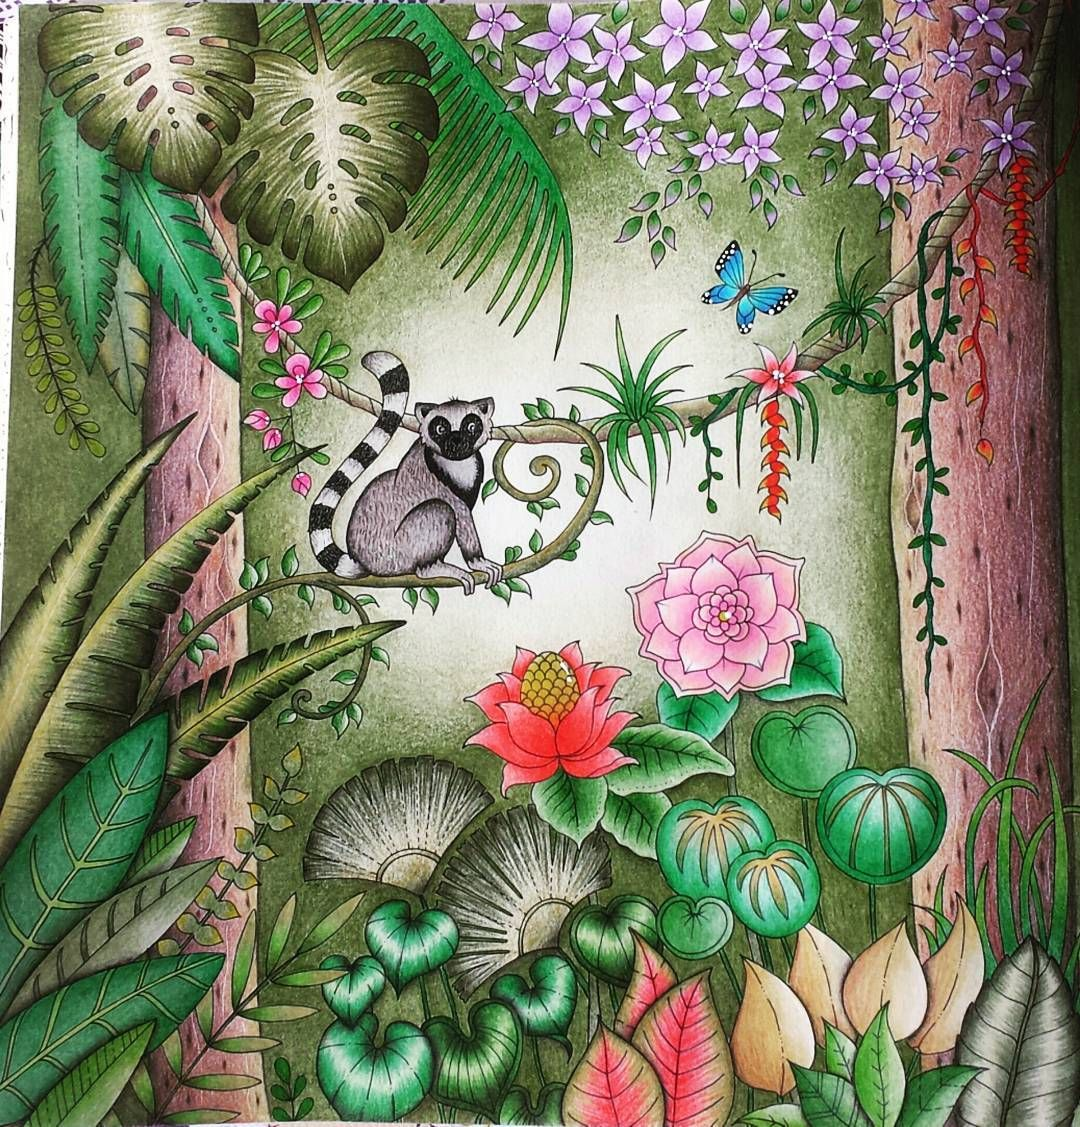 Parte 2 #MagicalJungle #SelvaMagica #johannabasford